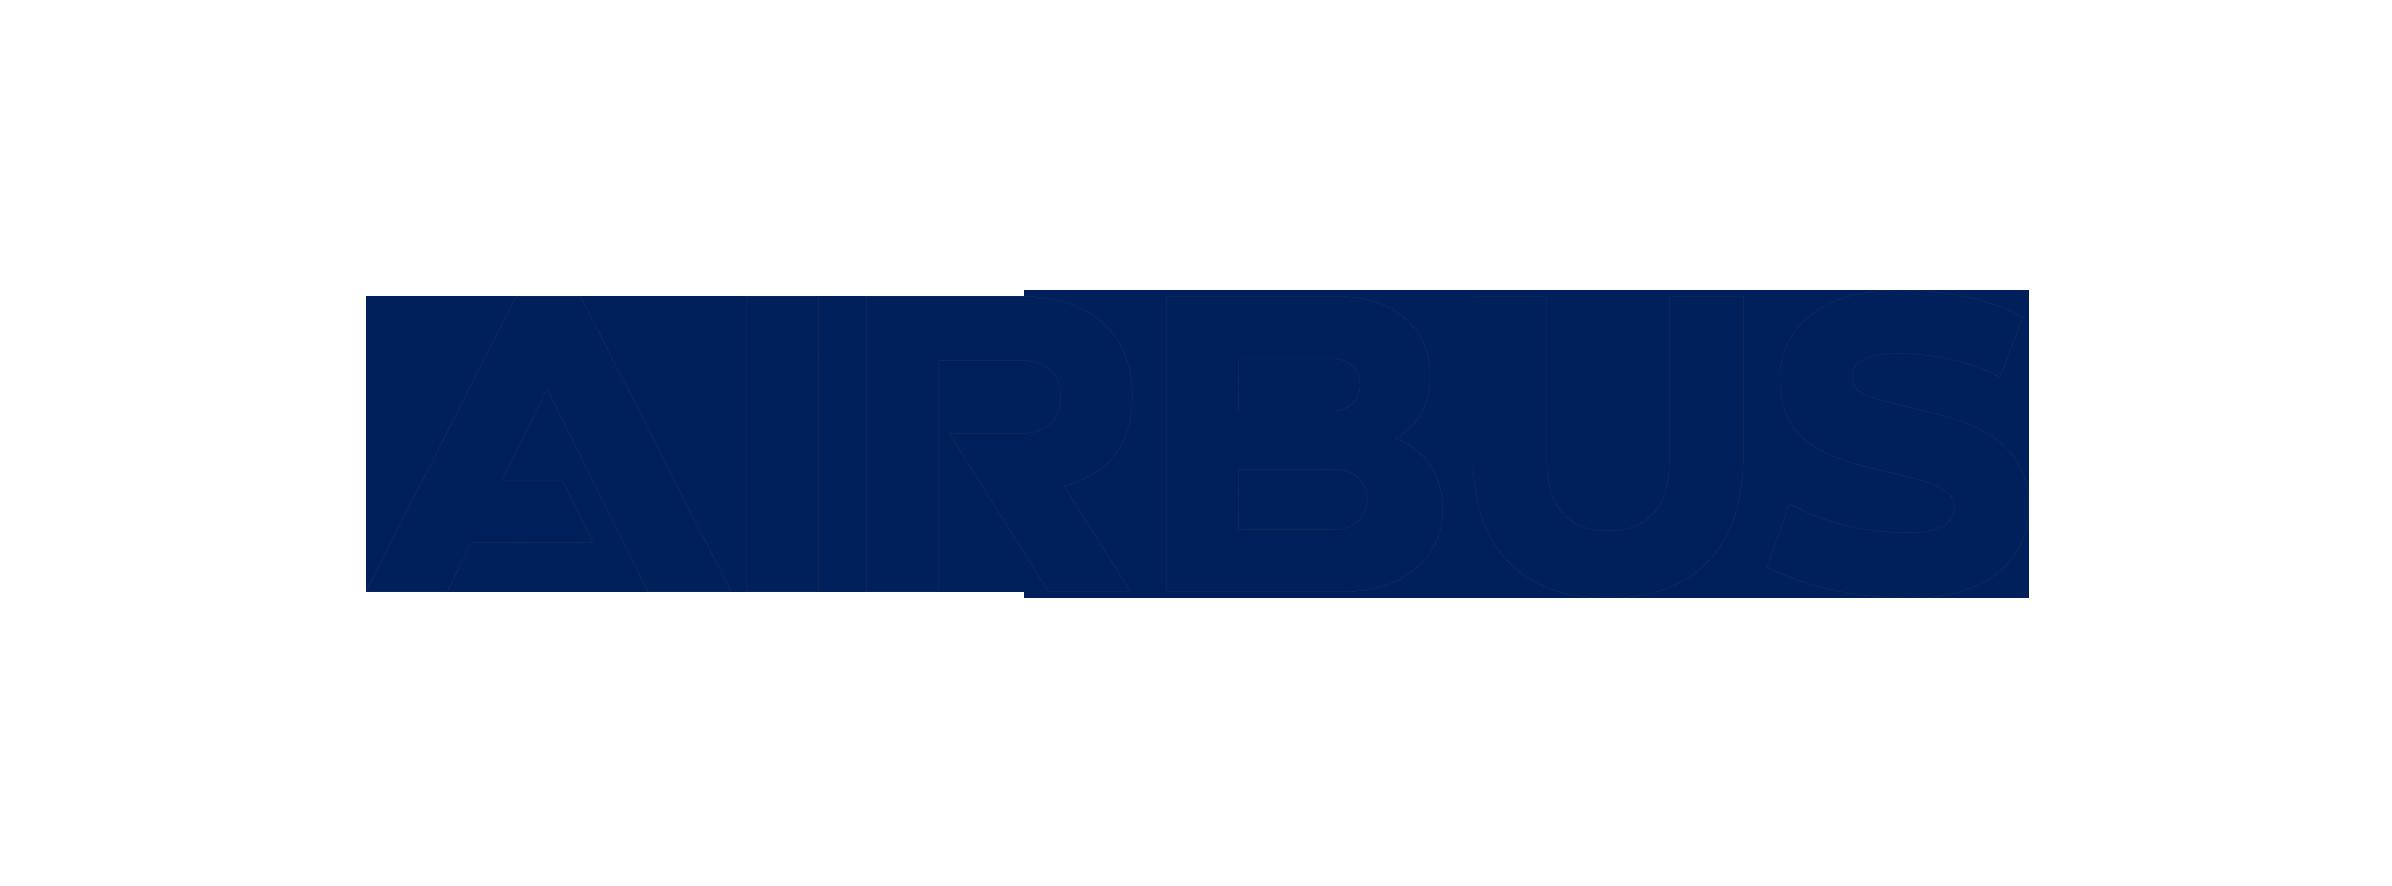 Airbus PNG - 7305